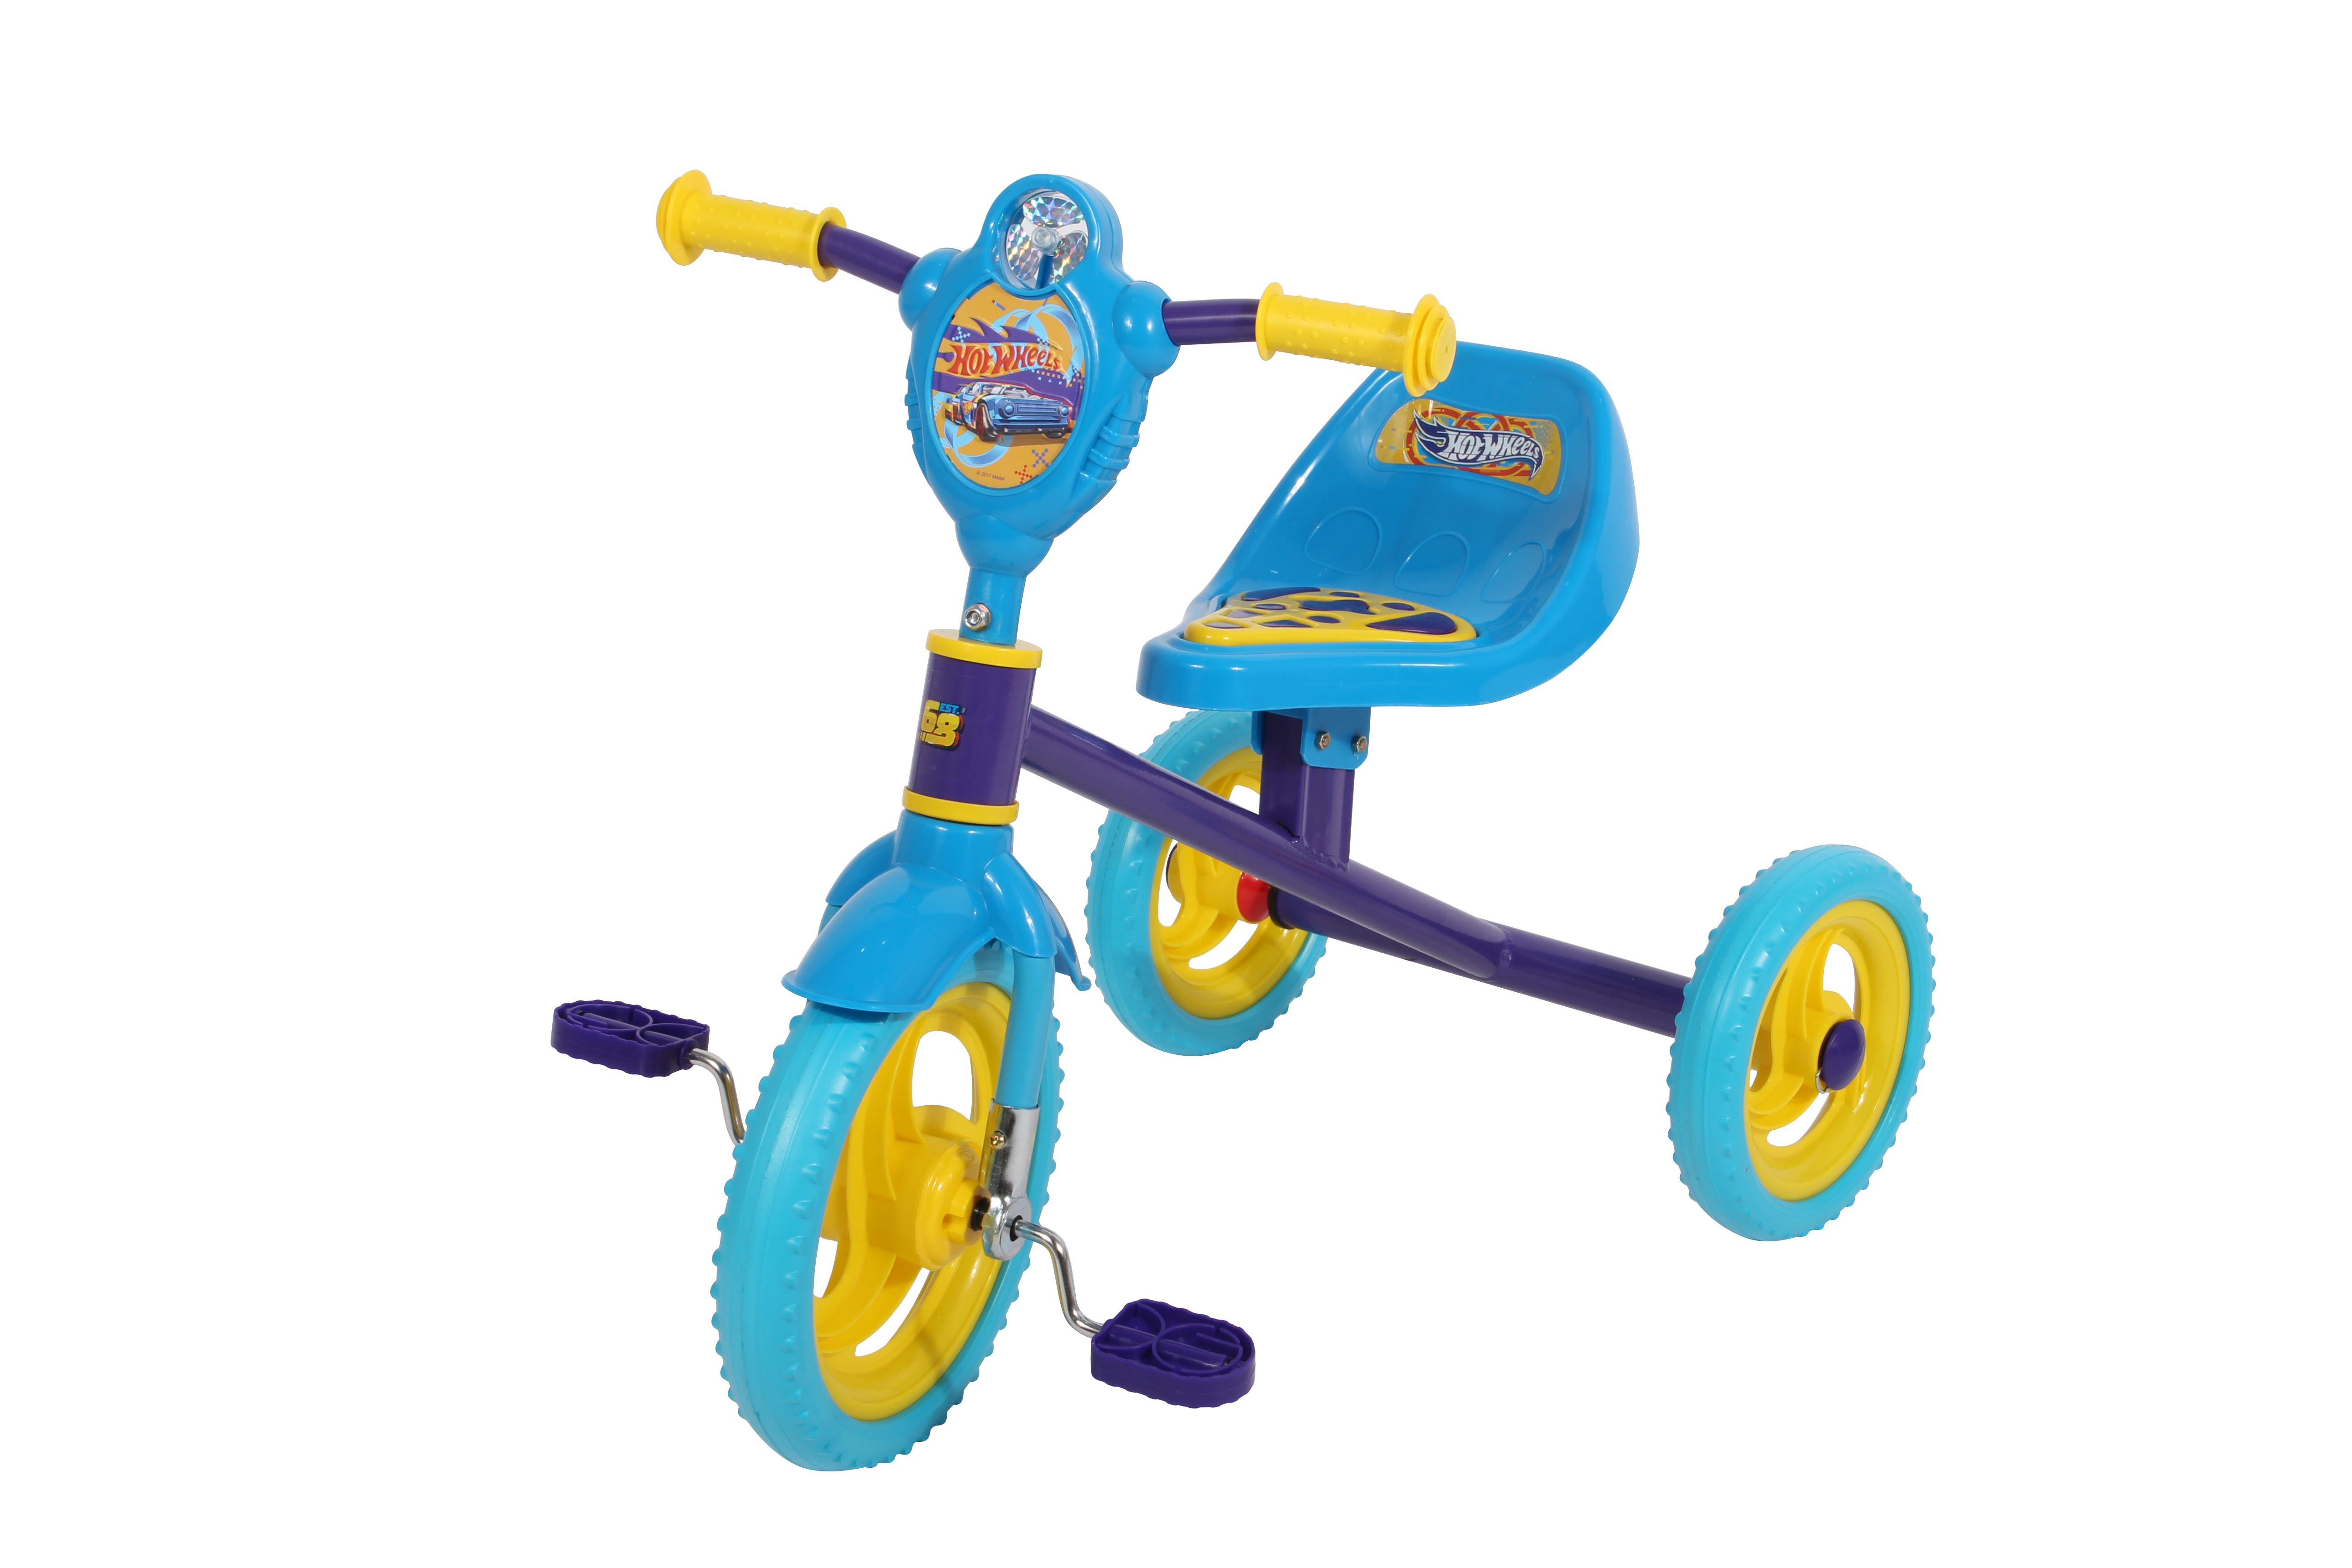 Hot Wheels 1toy Велосипед трехколесный 1Тoy «Hot Wheels» велосипеды трехколесные 1toy велосипед трехколесный 1тoy peppa